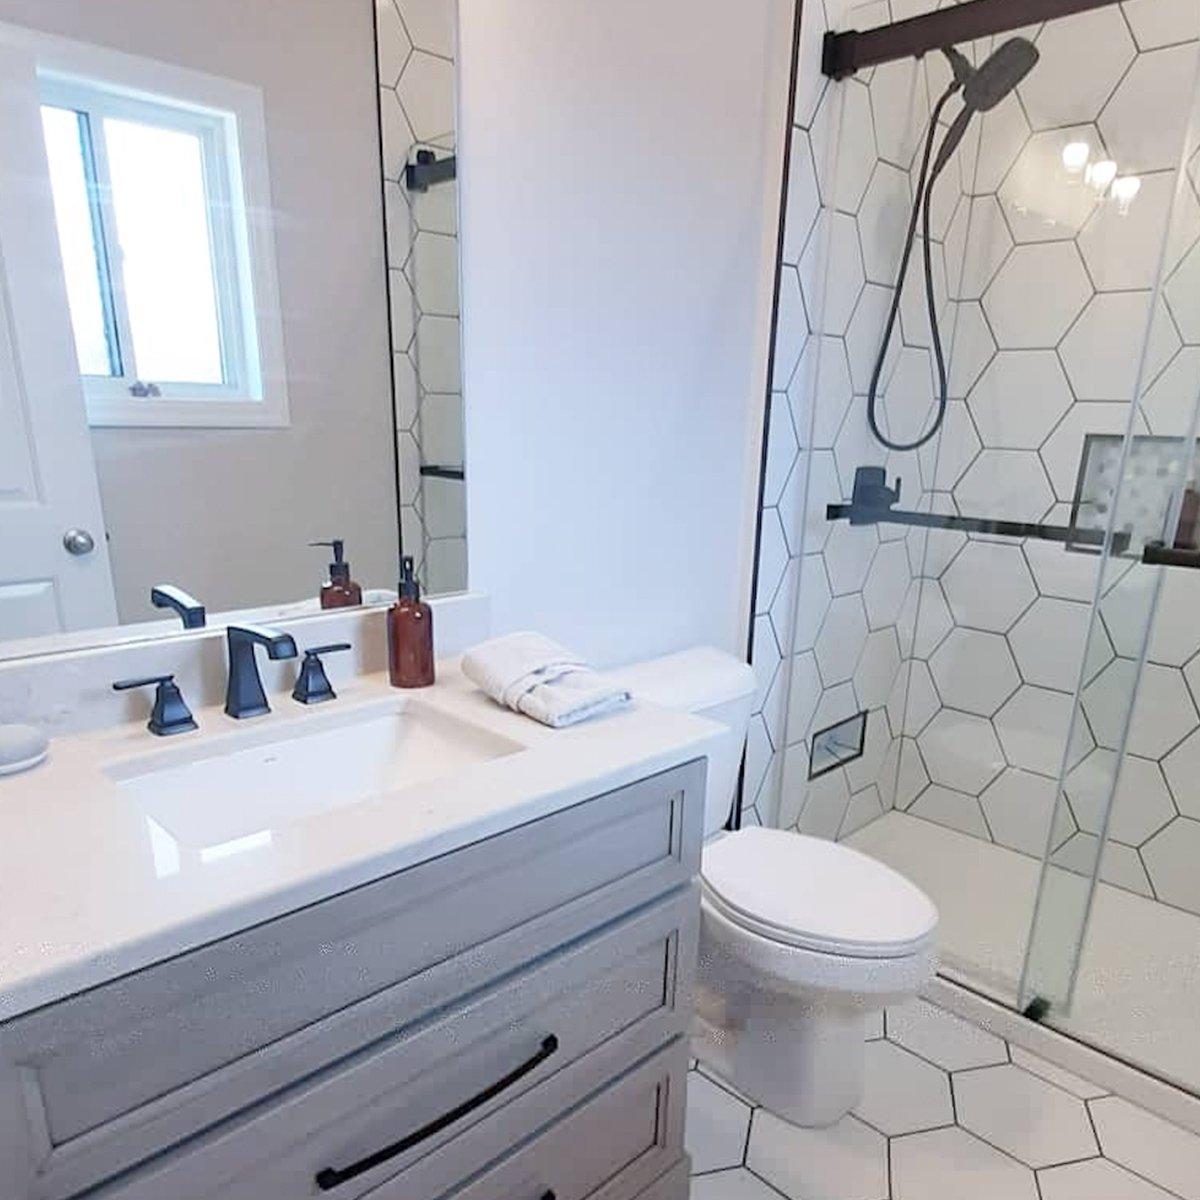 Kassar bathroom renovation